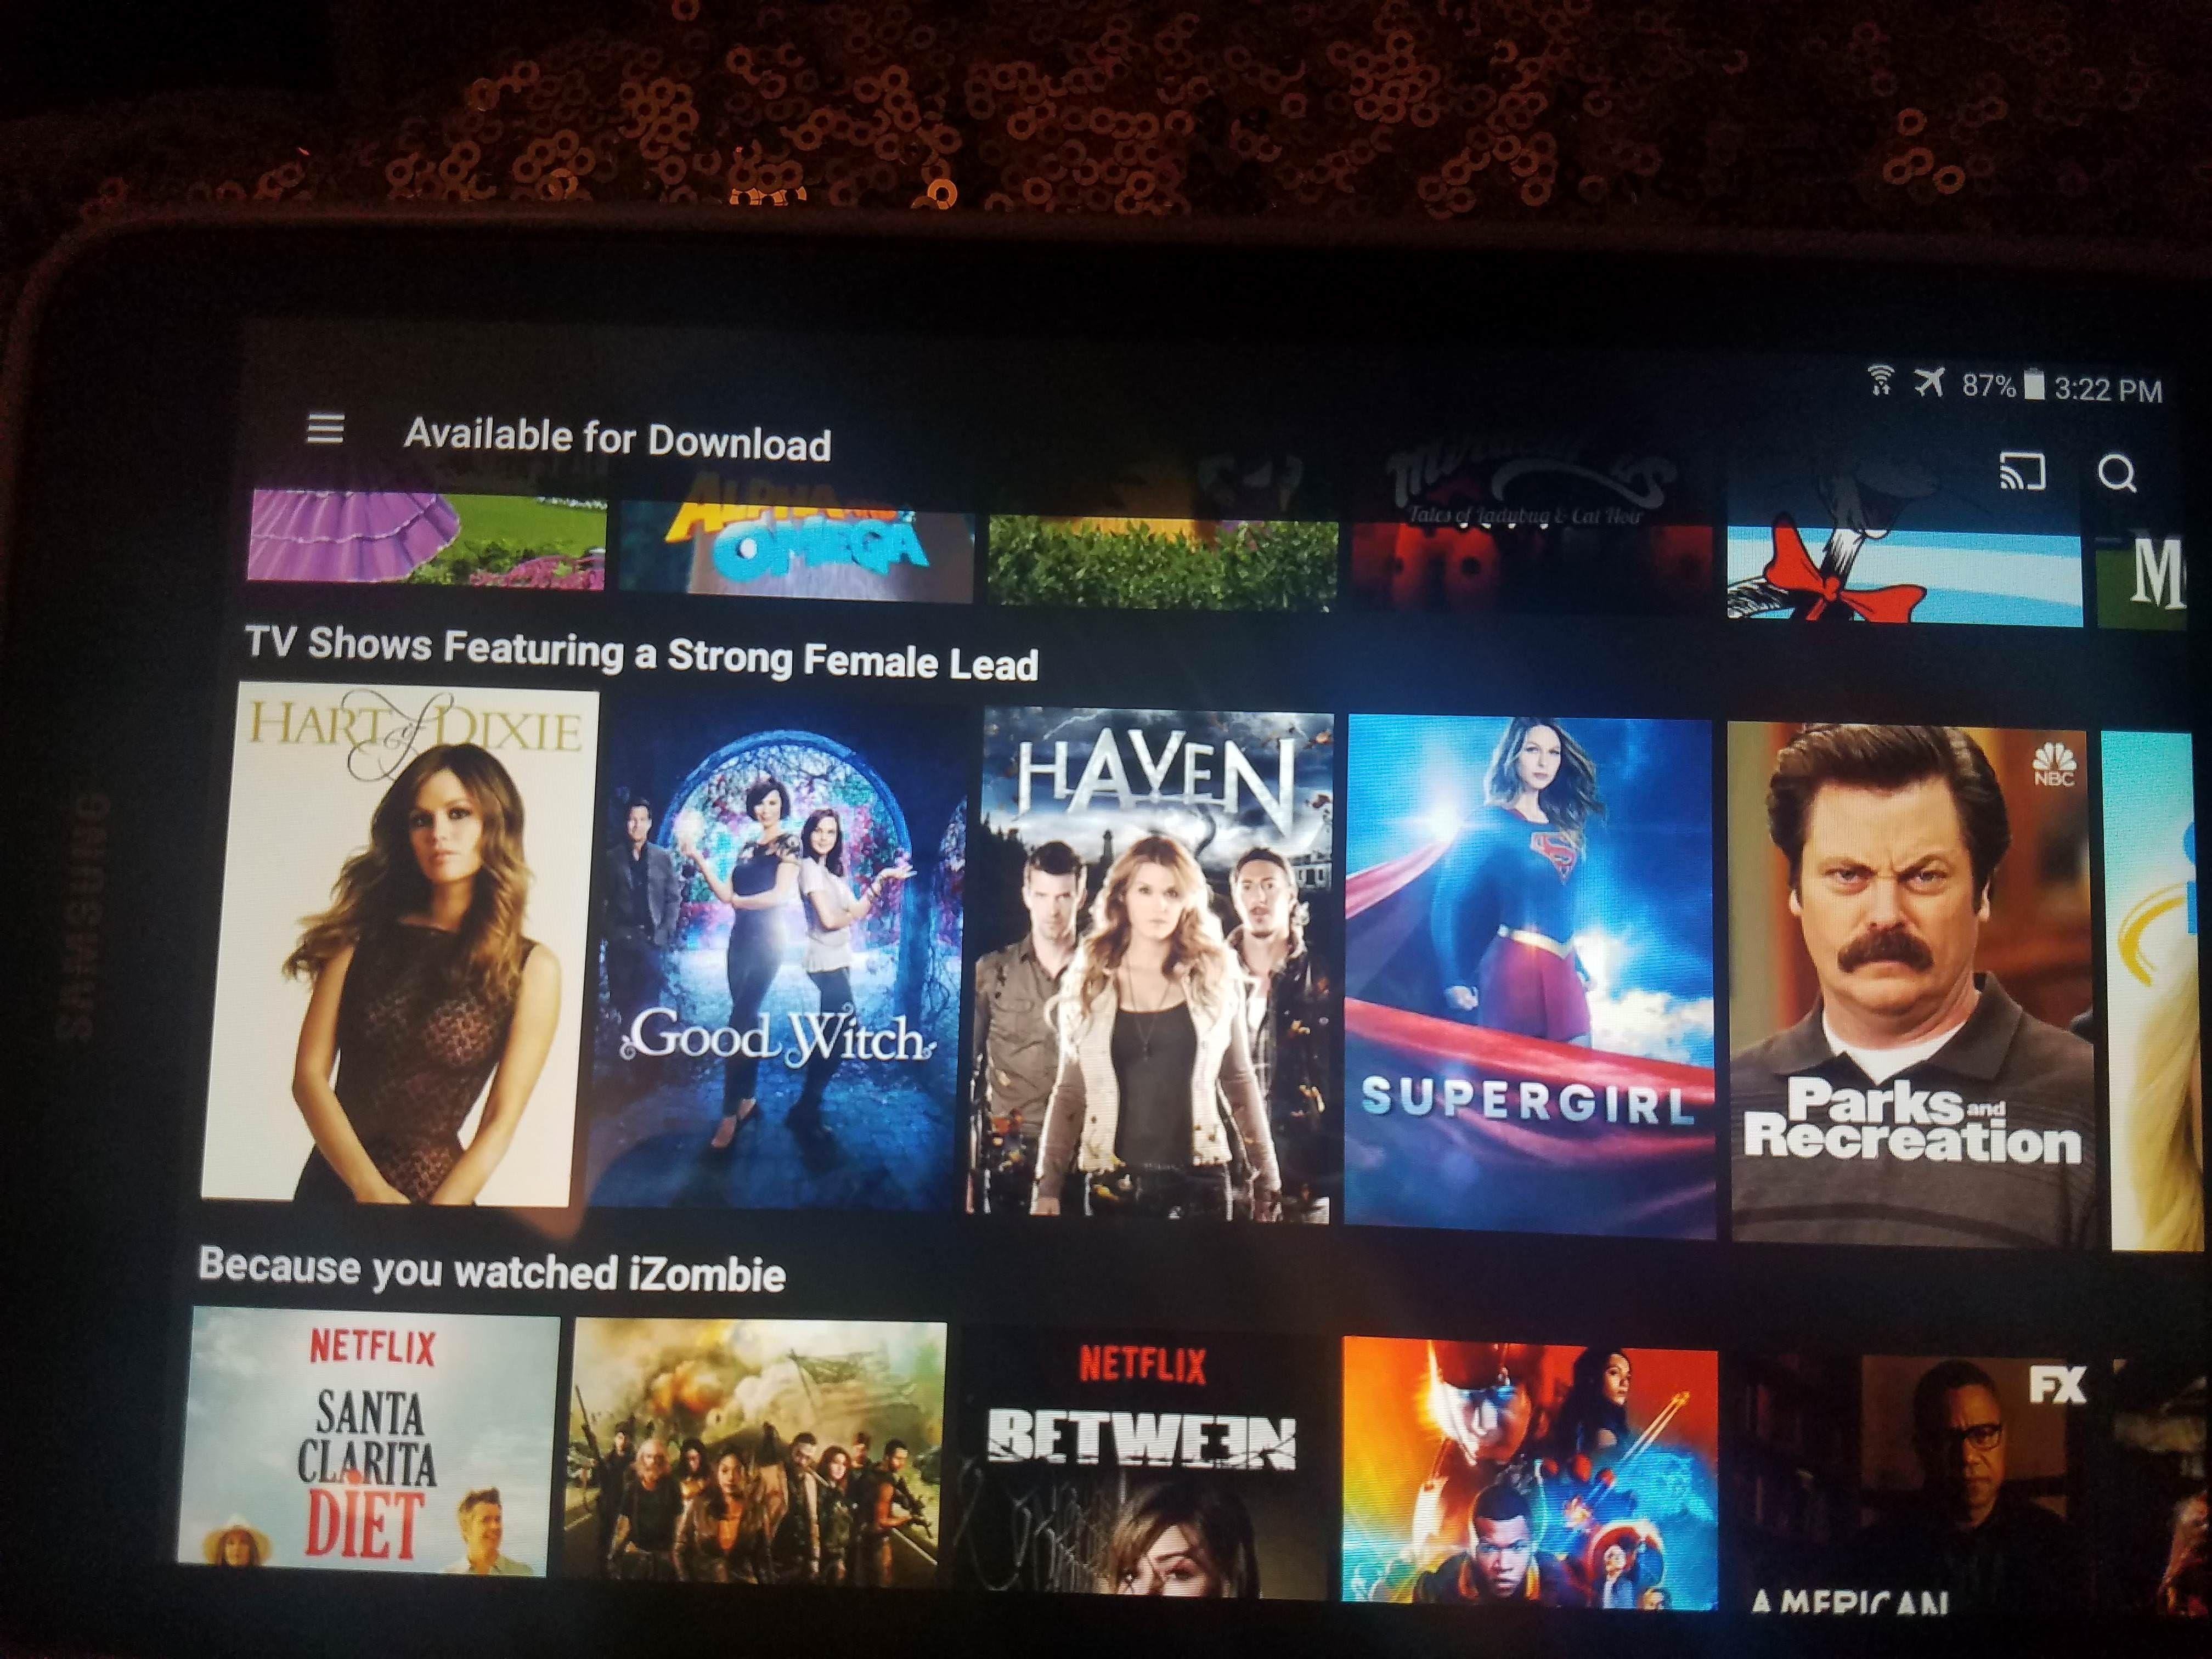 Netflix got it right! You go Ron!